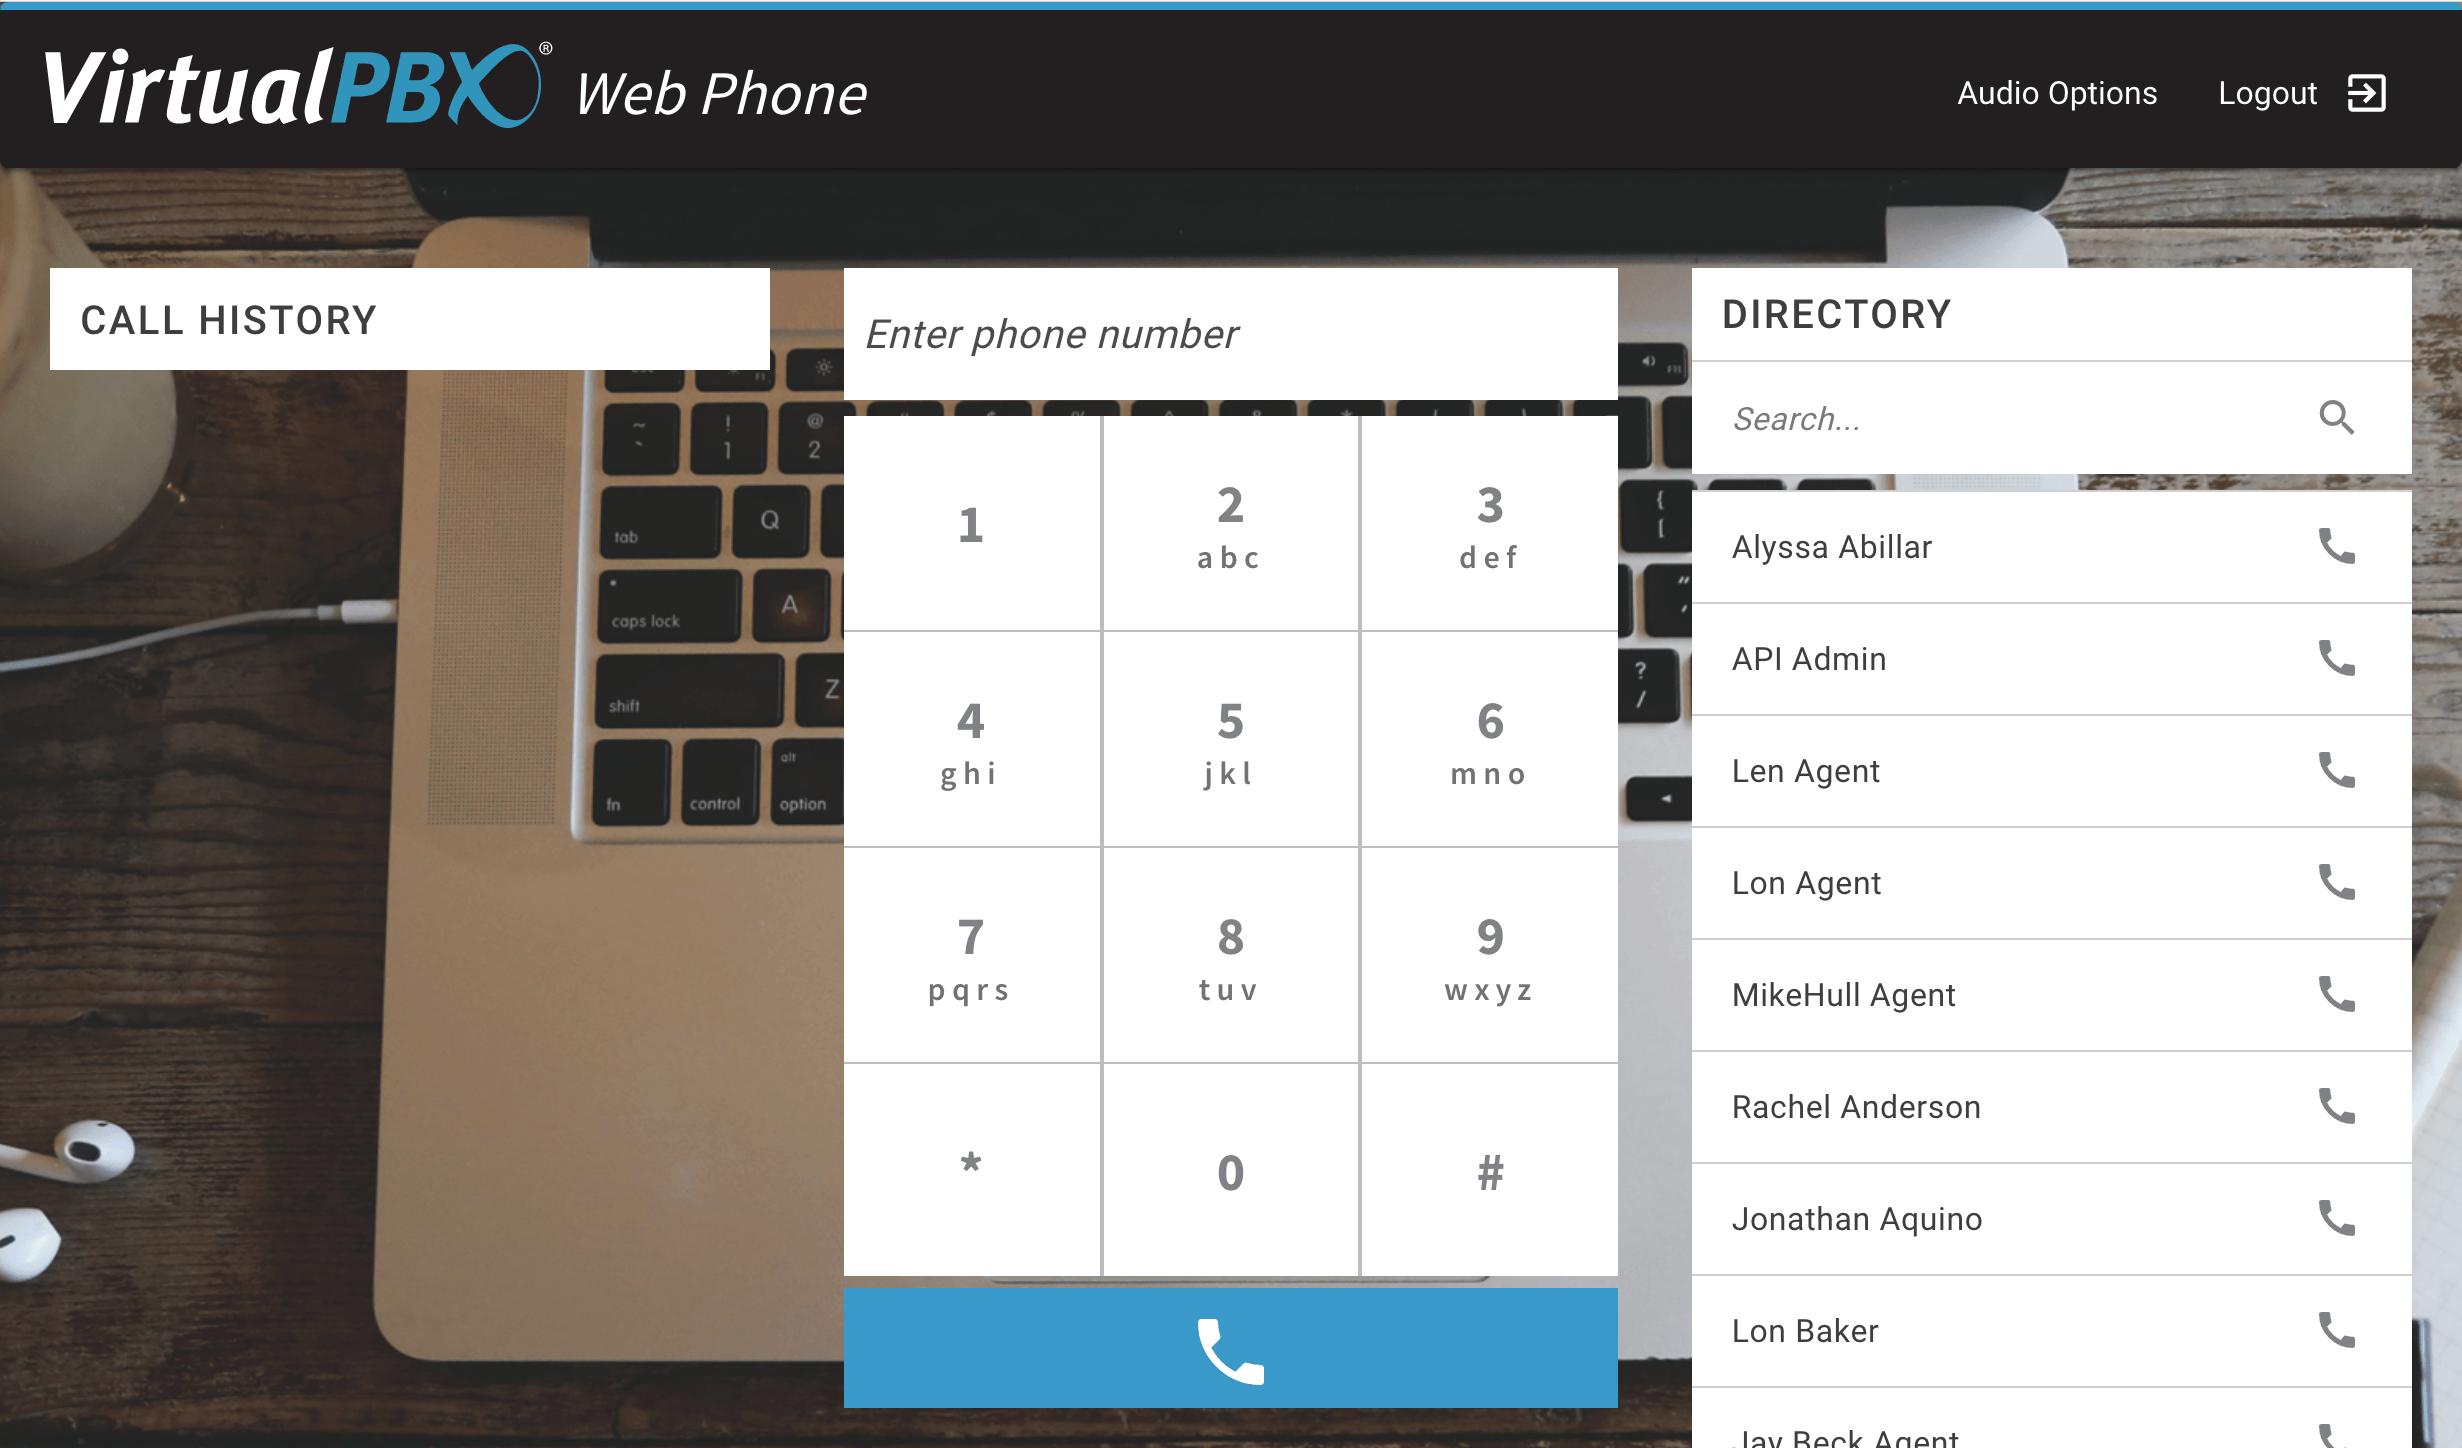 VirtualPBX Software - Web Phone